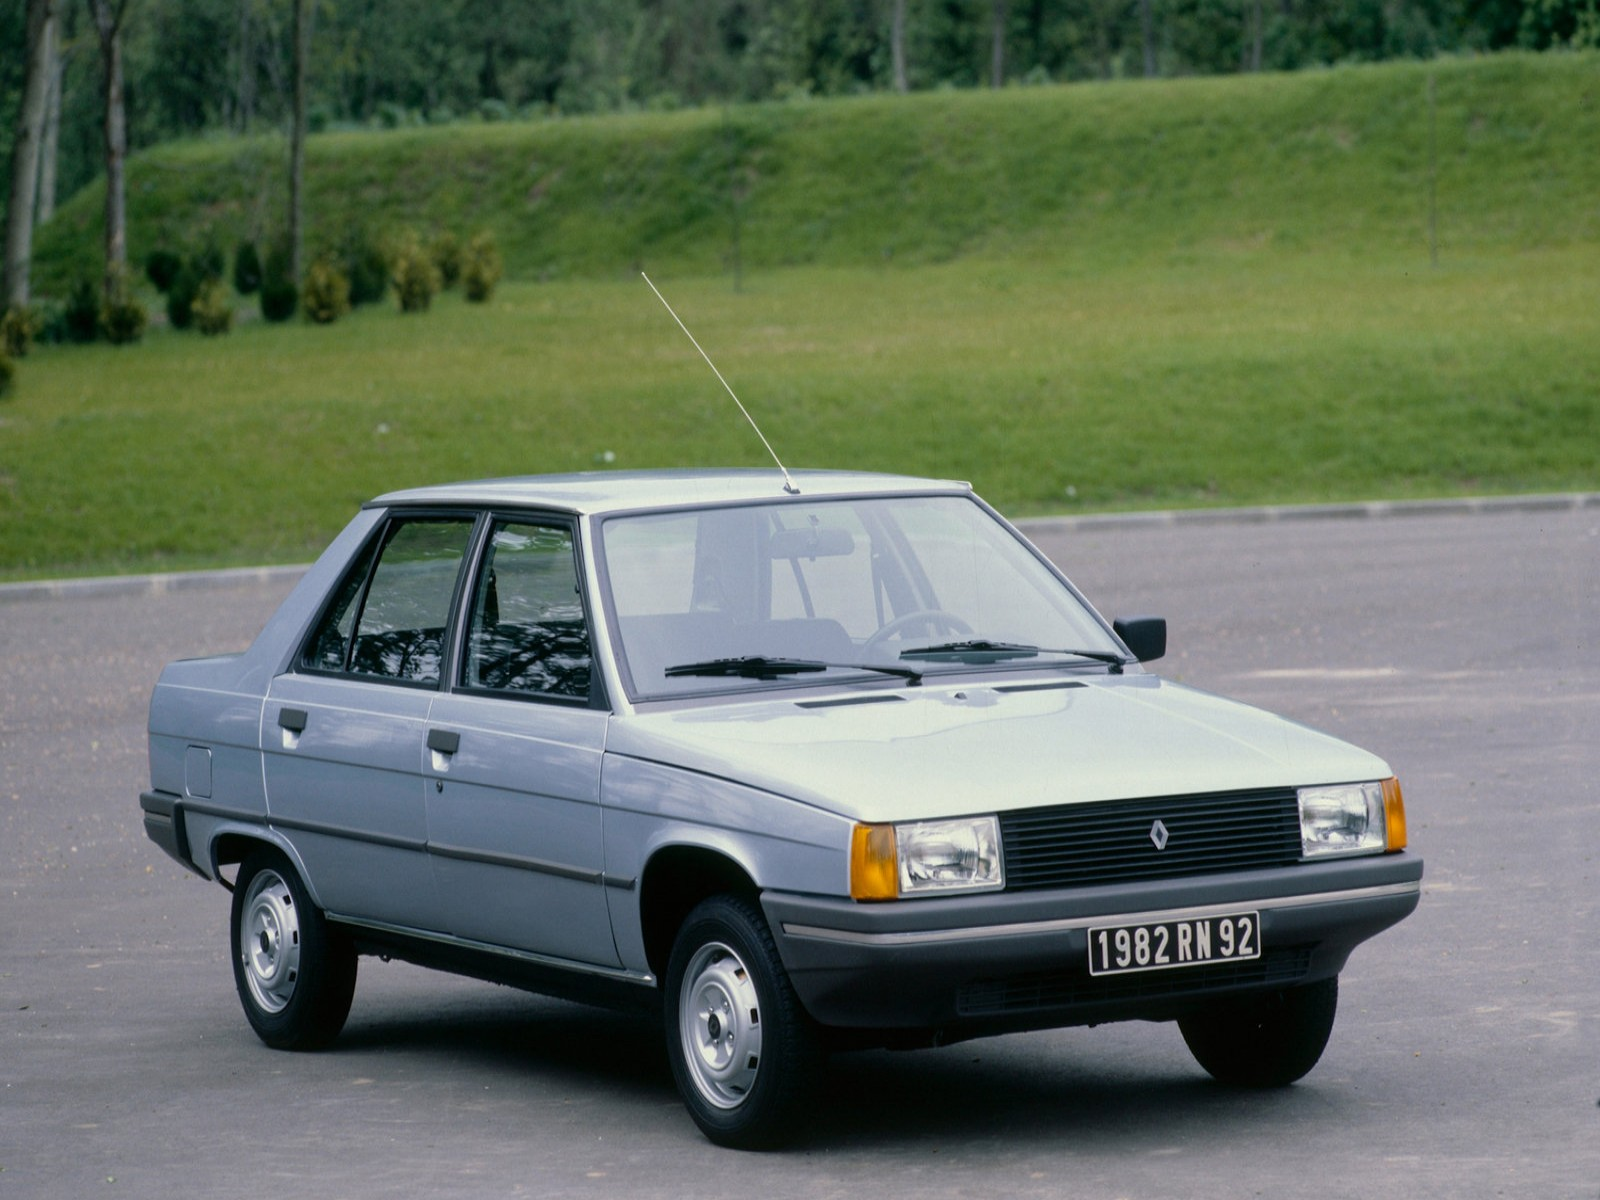 Renault 9 (1982)